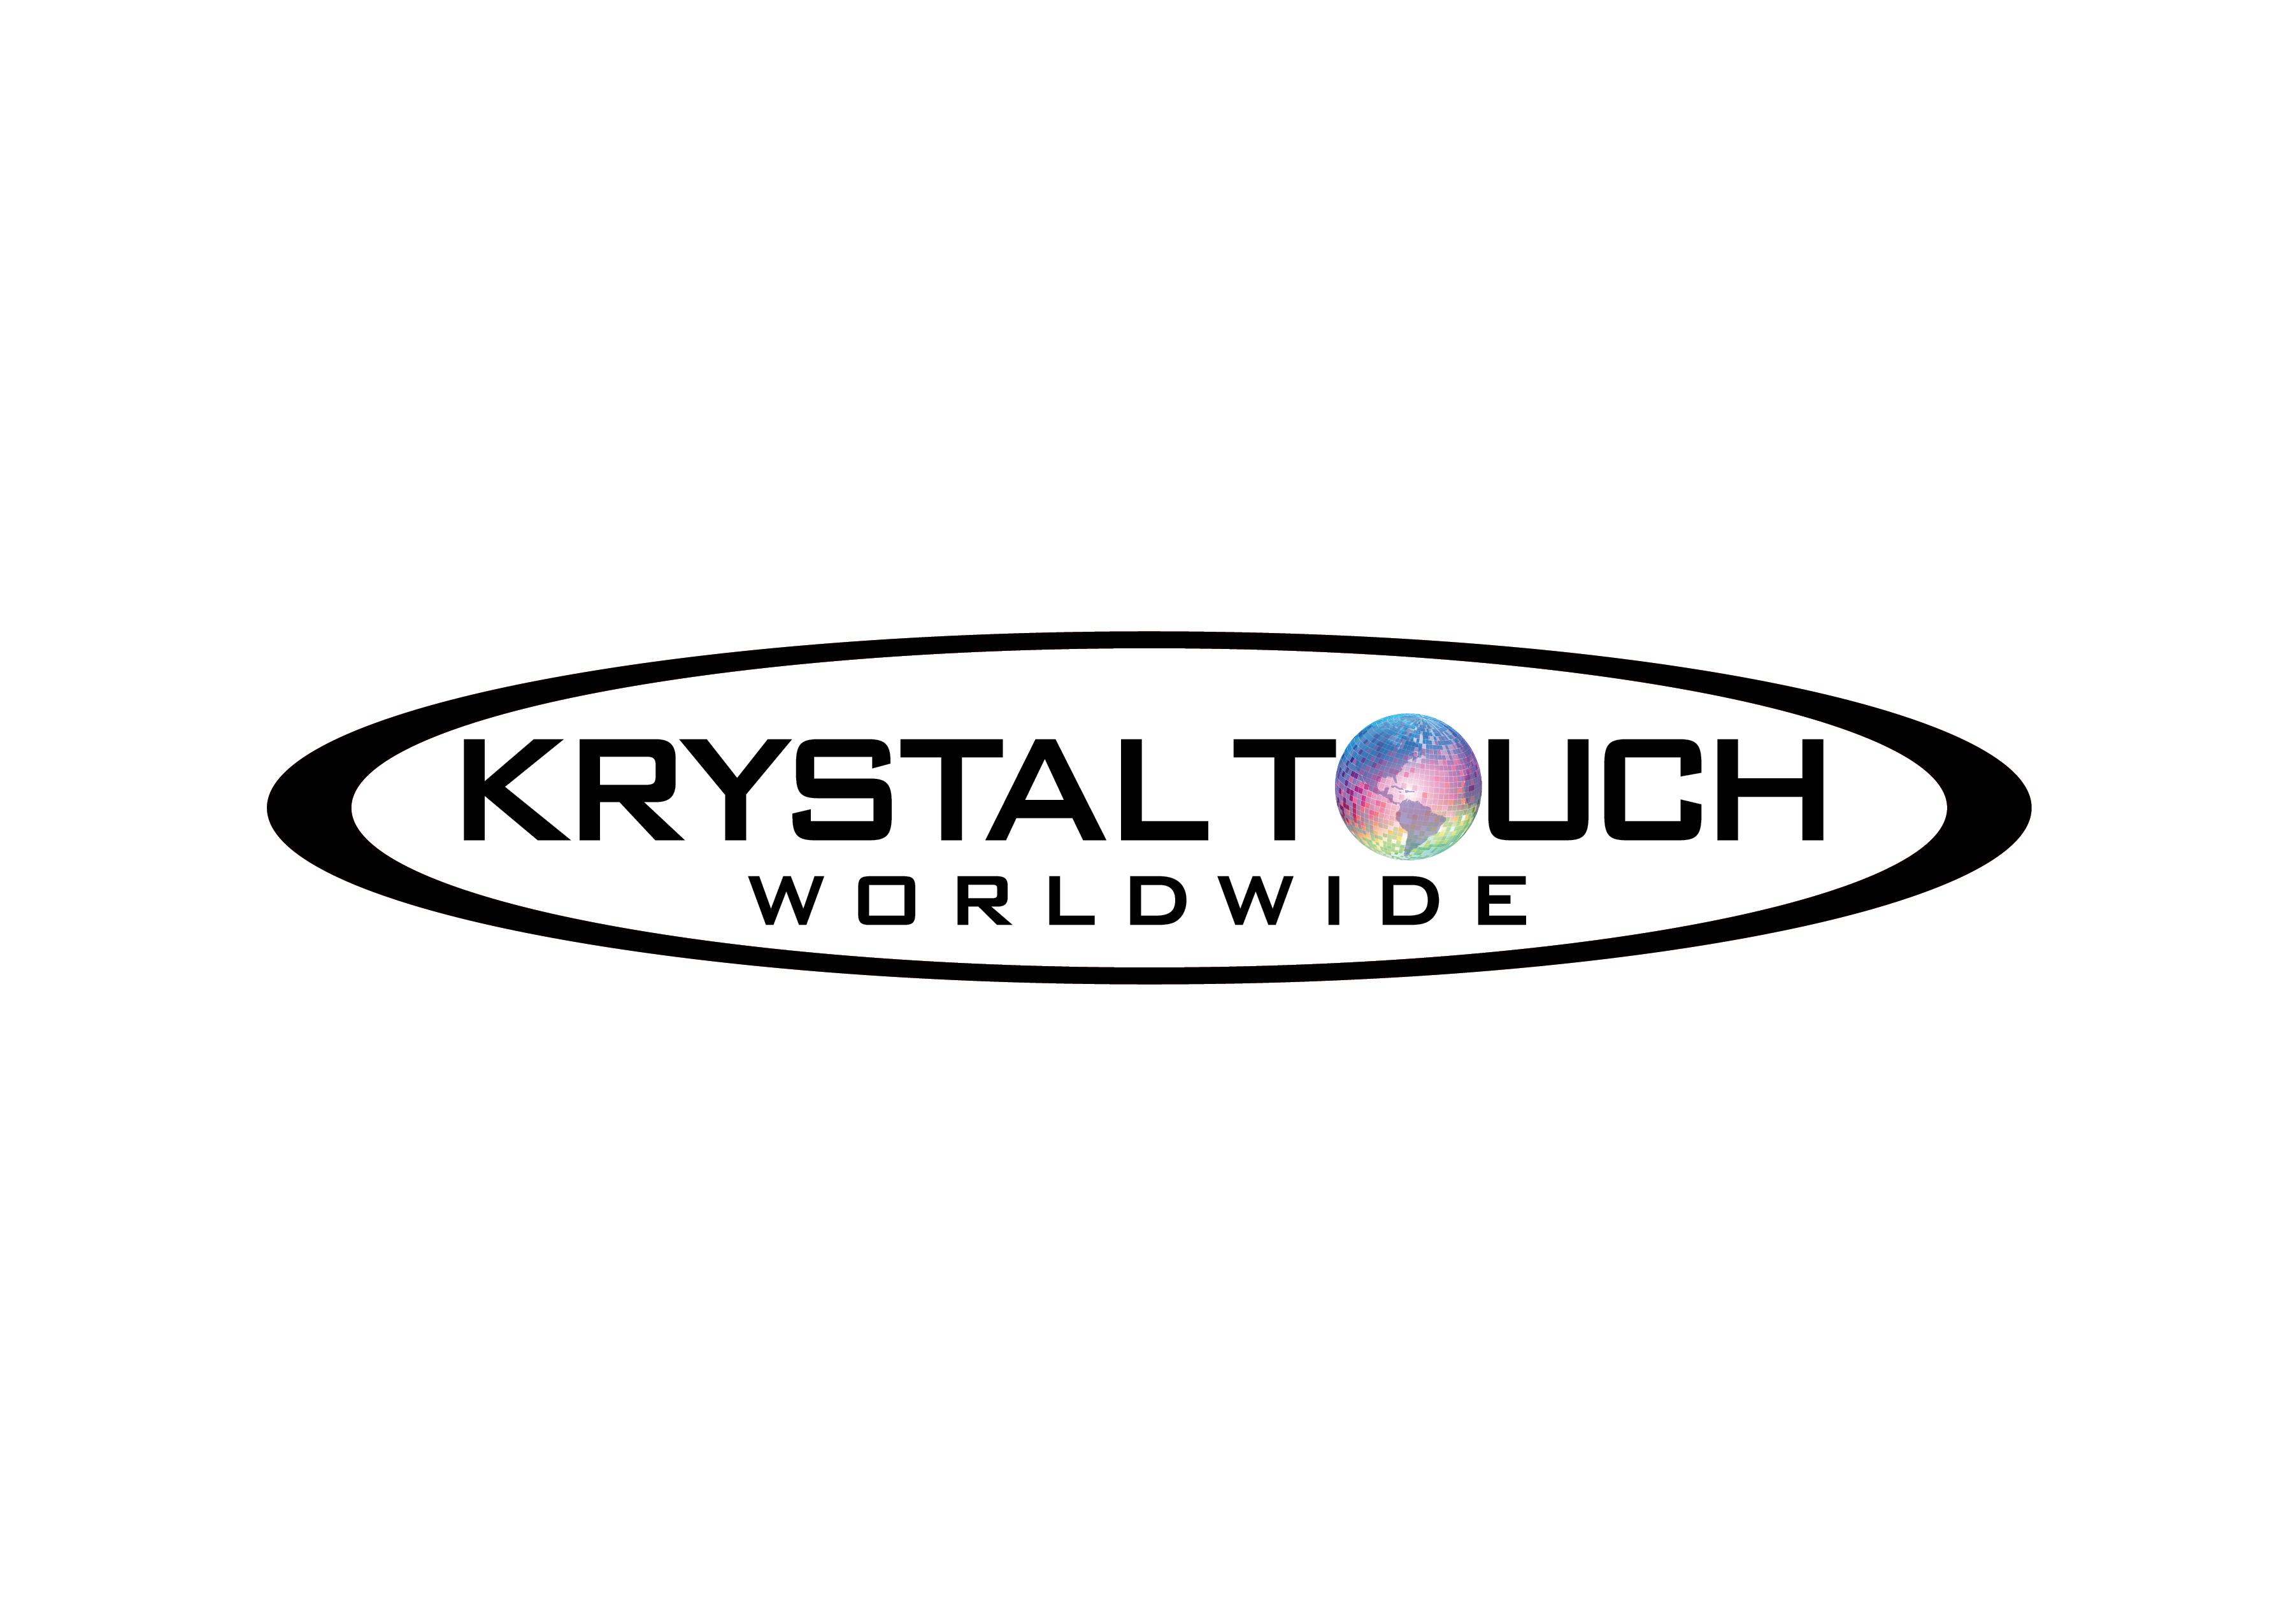 Logo design, as seen in major retailers